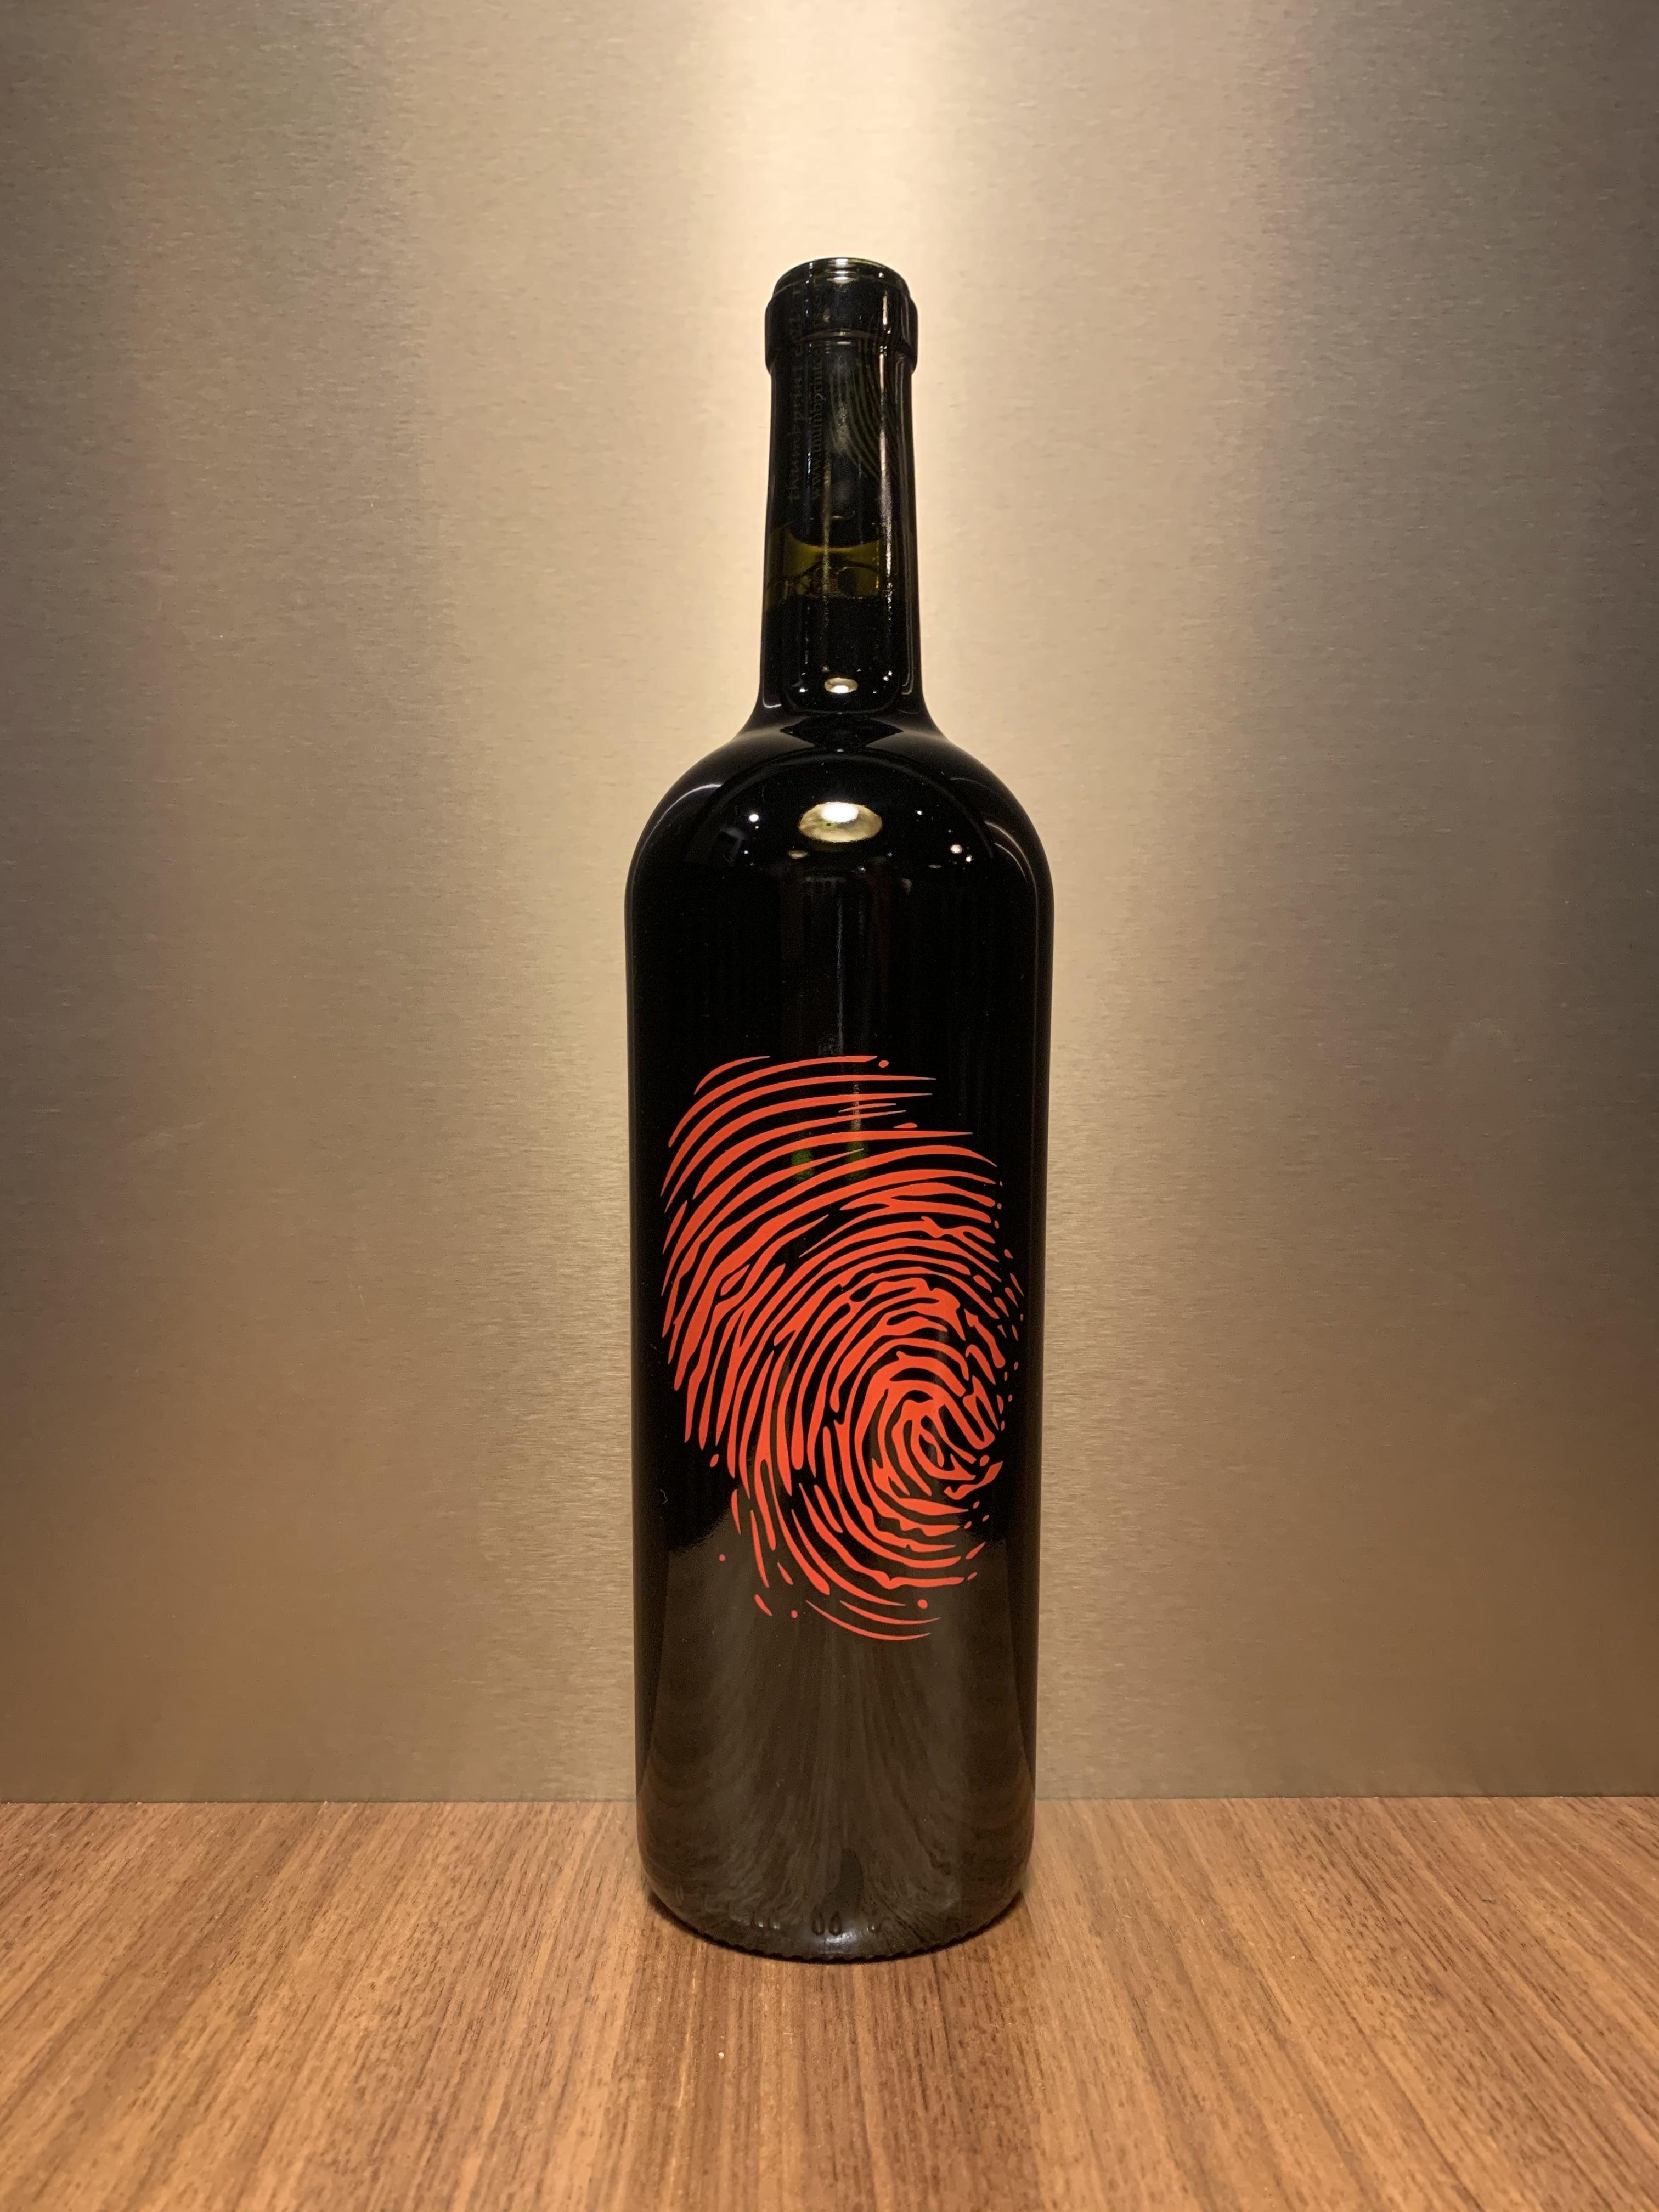 2013 Cabernet Sauvignon - Andolsen Vineyard